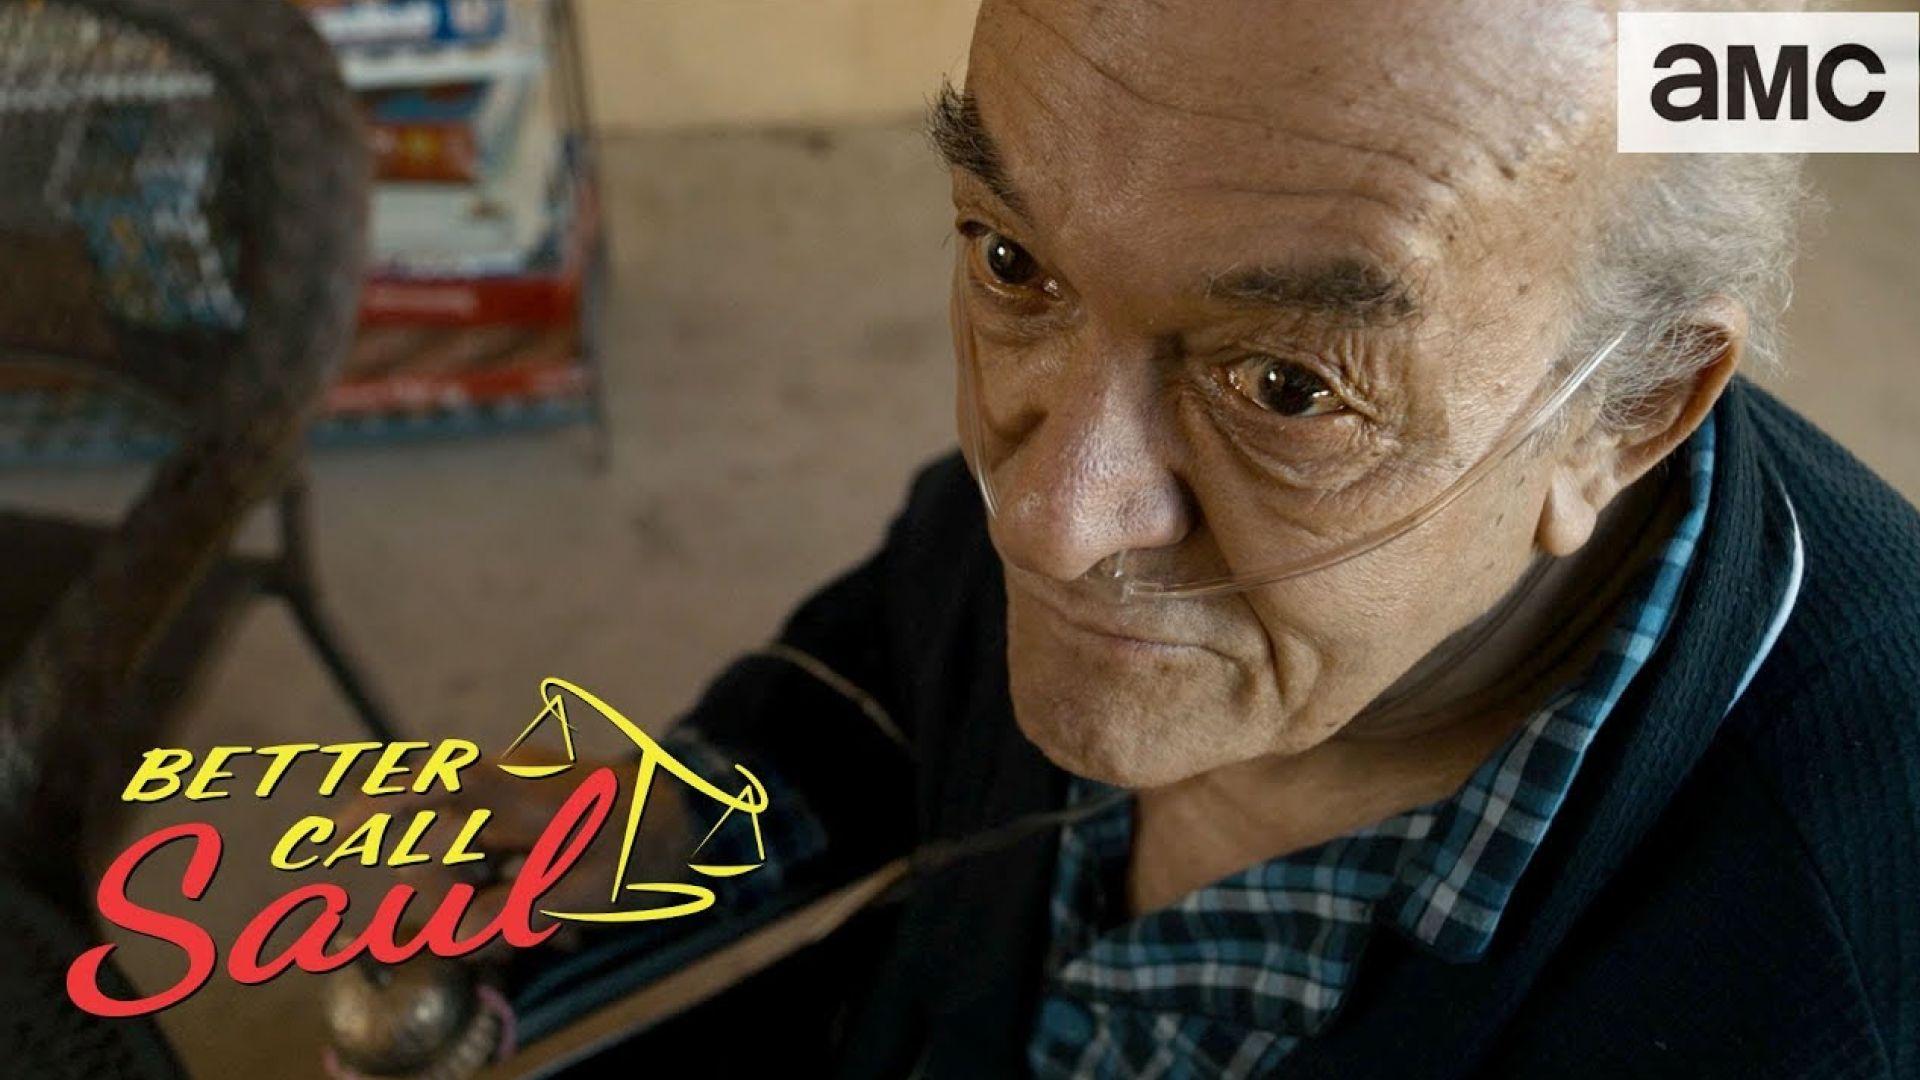 Better Call Saul: A Look at Season 5 | Returns February 23